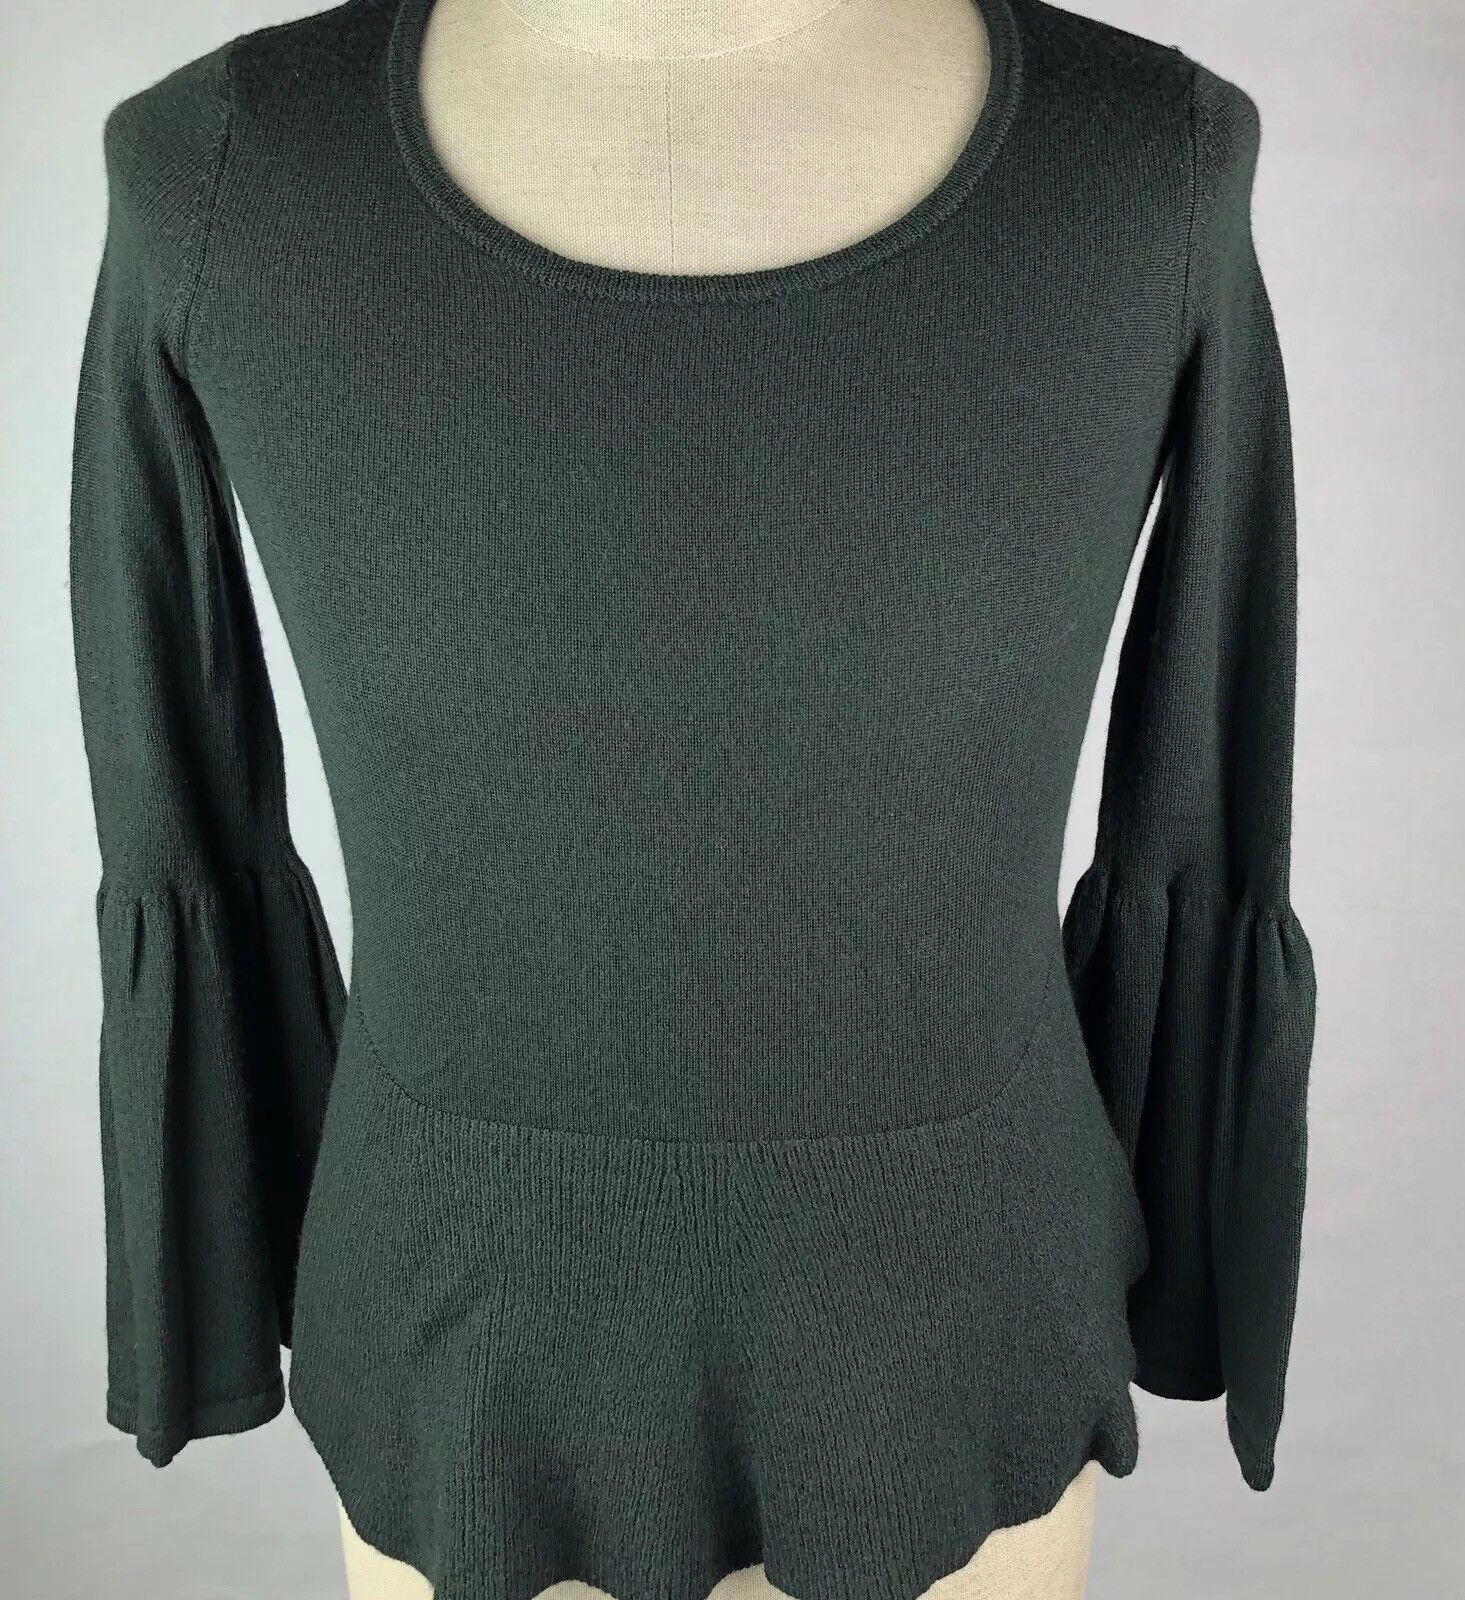 Nanette Lepore Green Merino Wool Sweater Sz XS Bell Sleeve Pepulum Sweater Ww